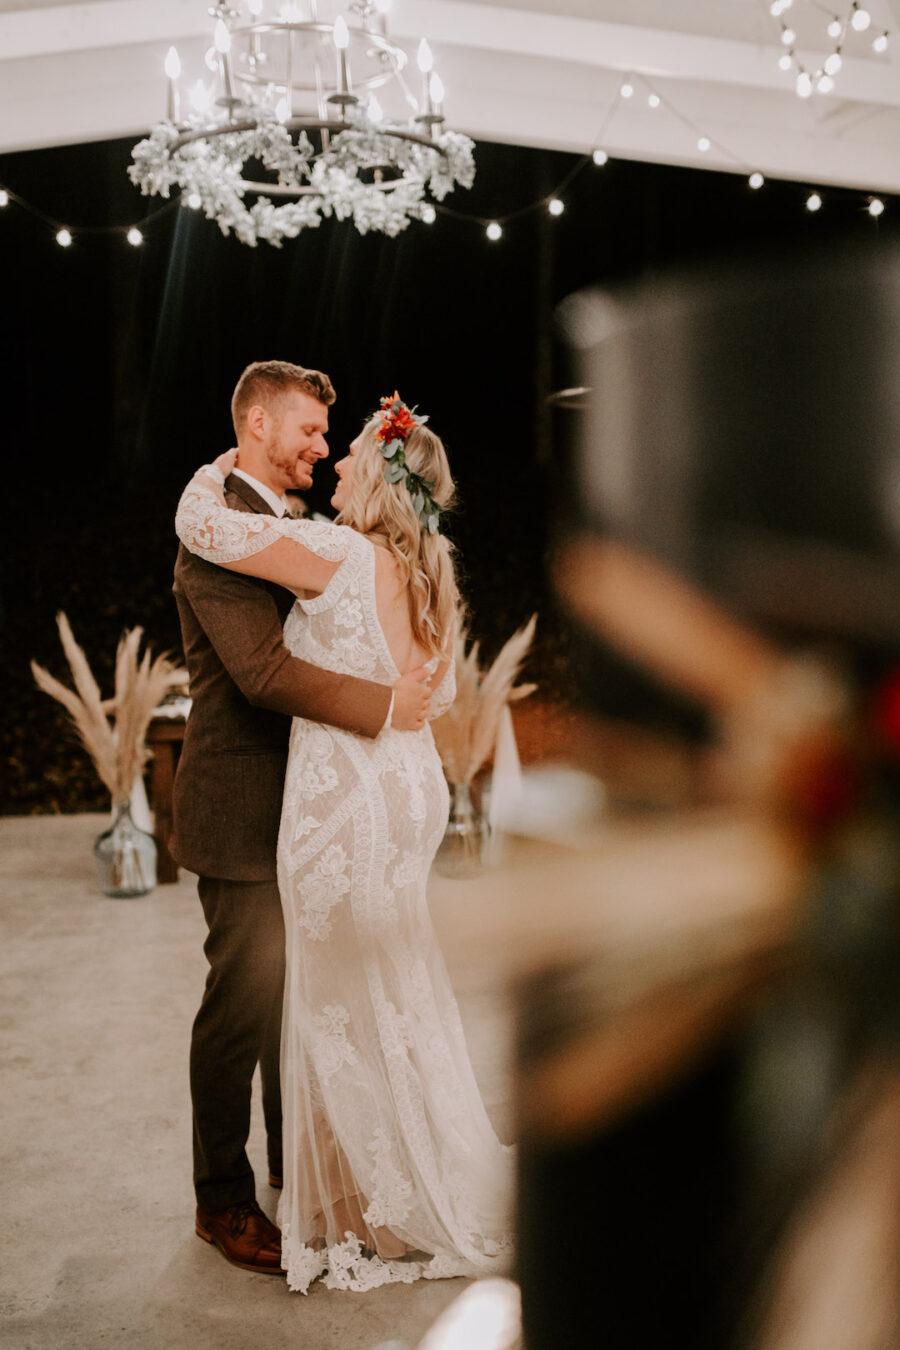 Wedding first dance at Firefly Lane